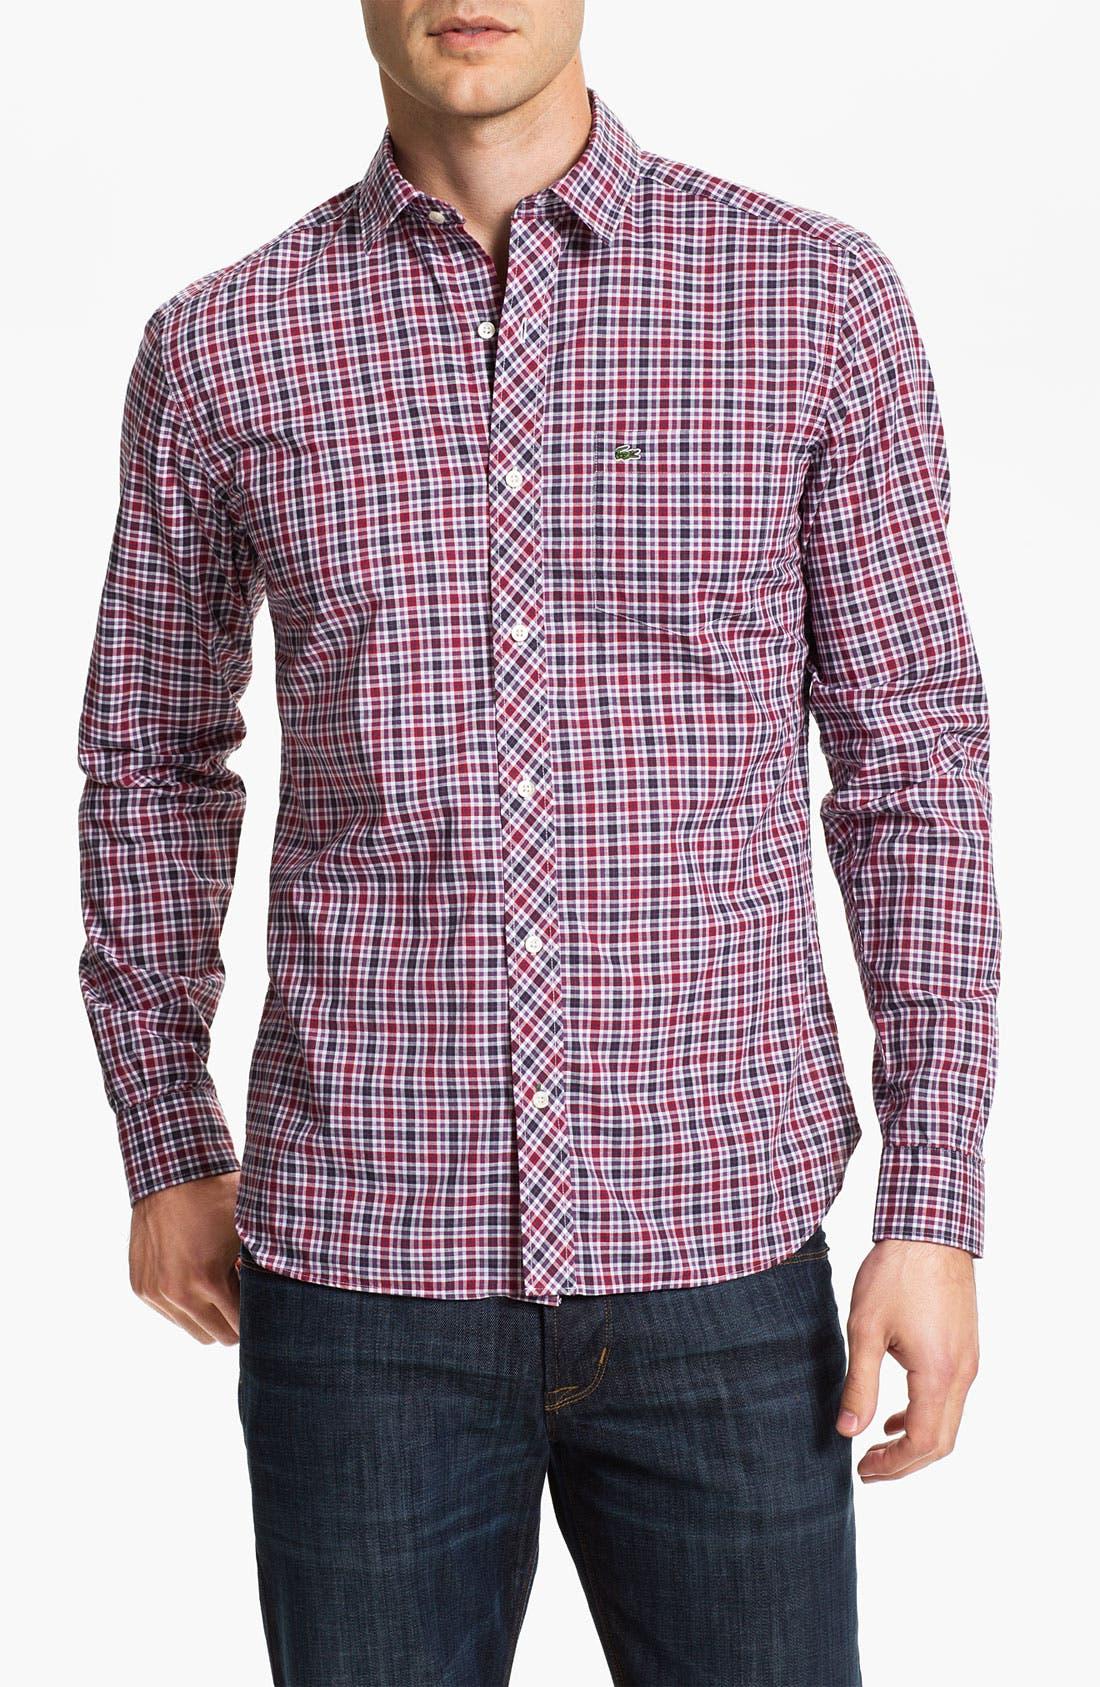 Alternate Image 1 Selected - Lacoste Slim Fit Plaid Sport Shirt